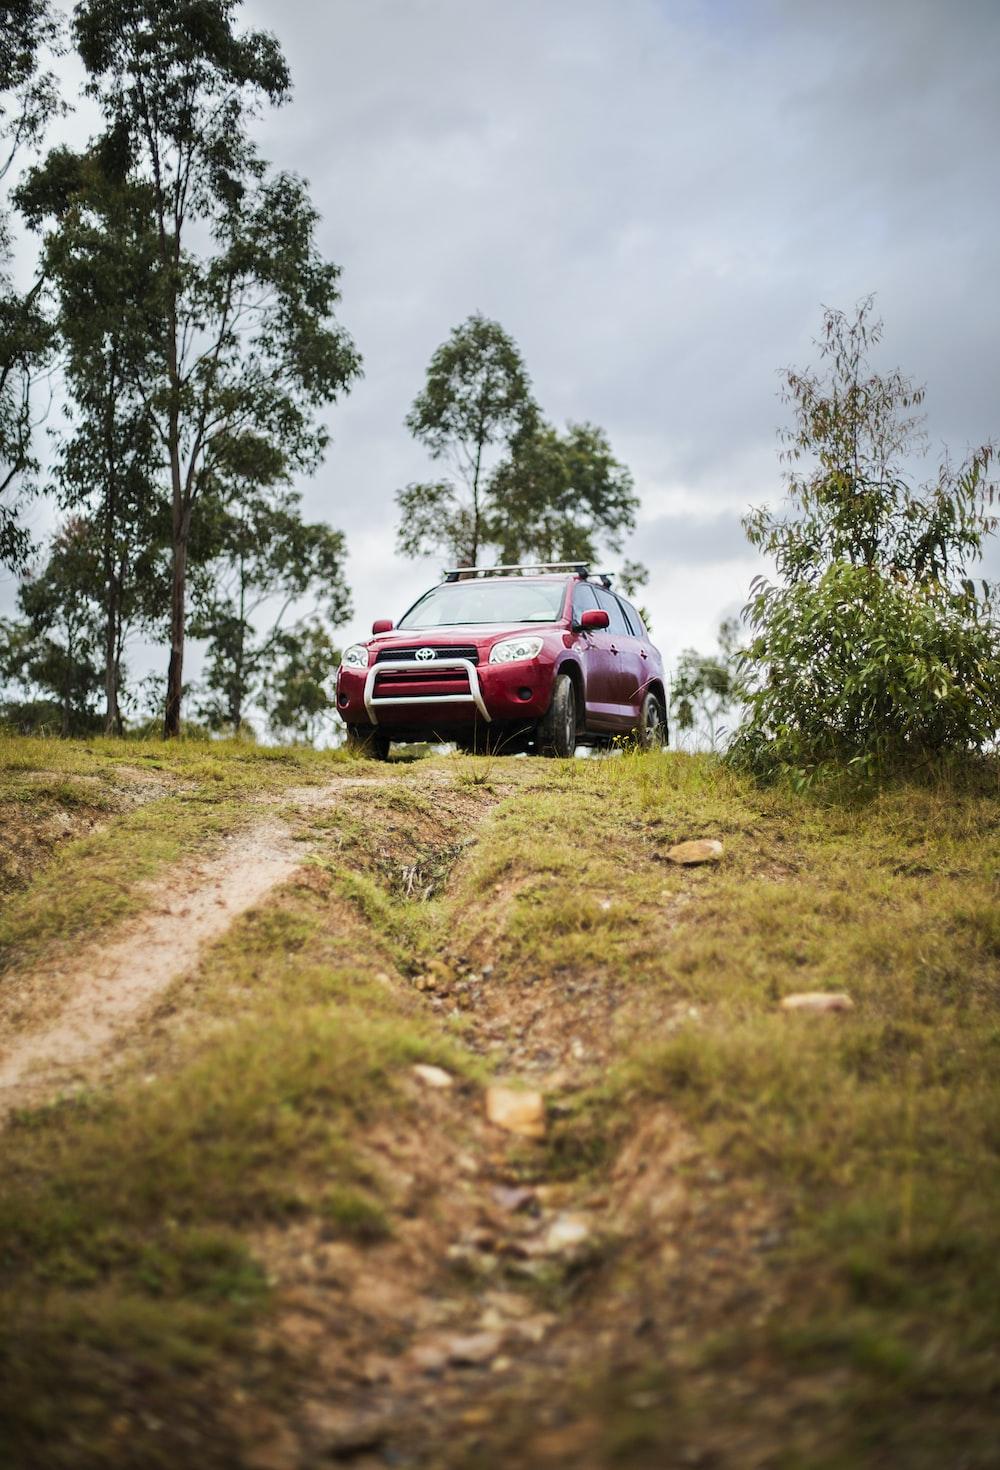 photo of red RAV 4 SUV on roadway, best car brand 2020